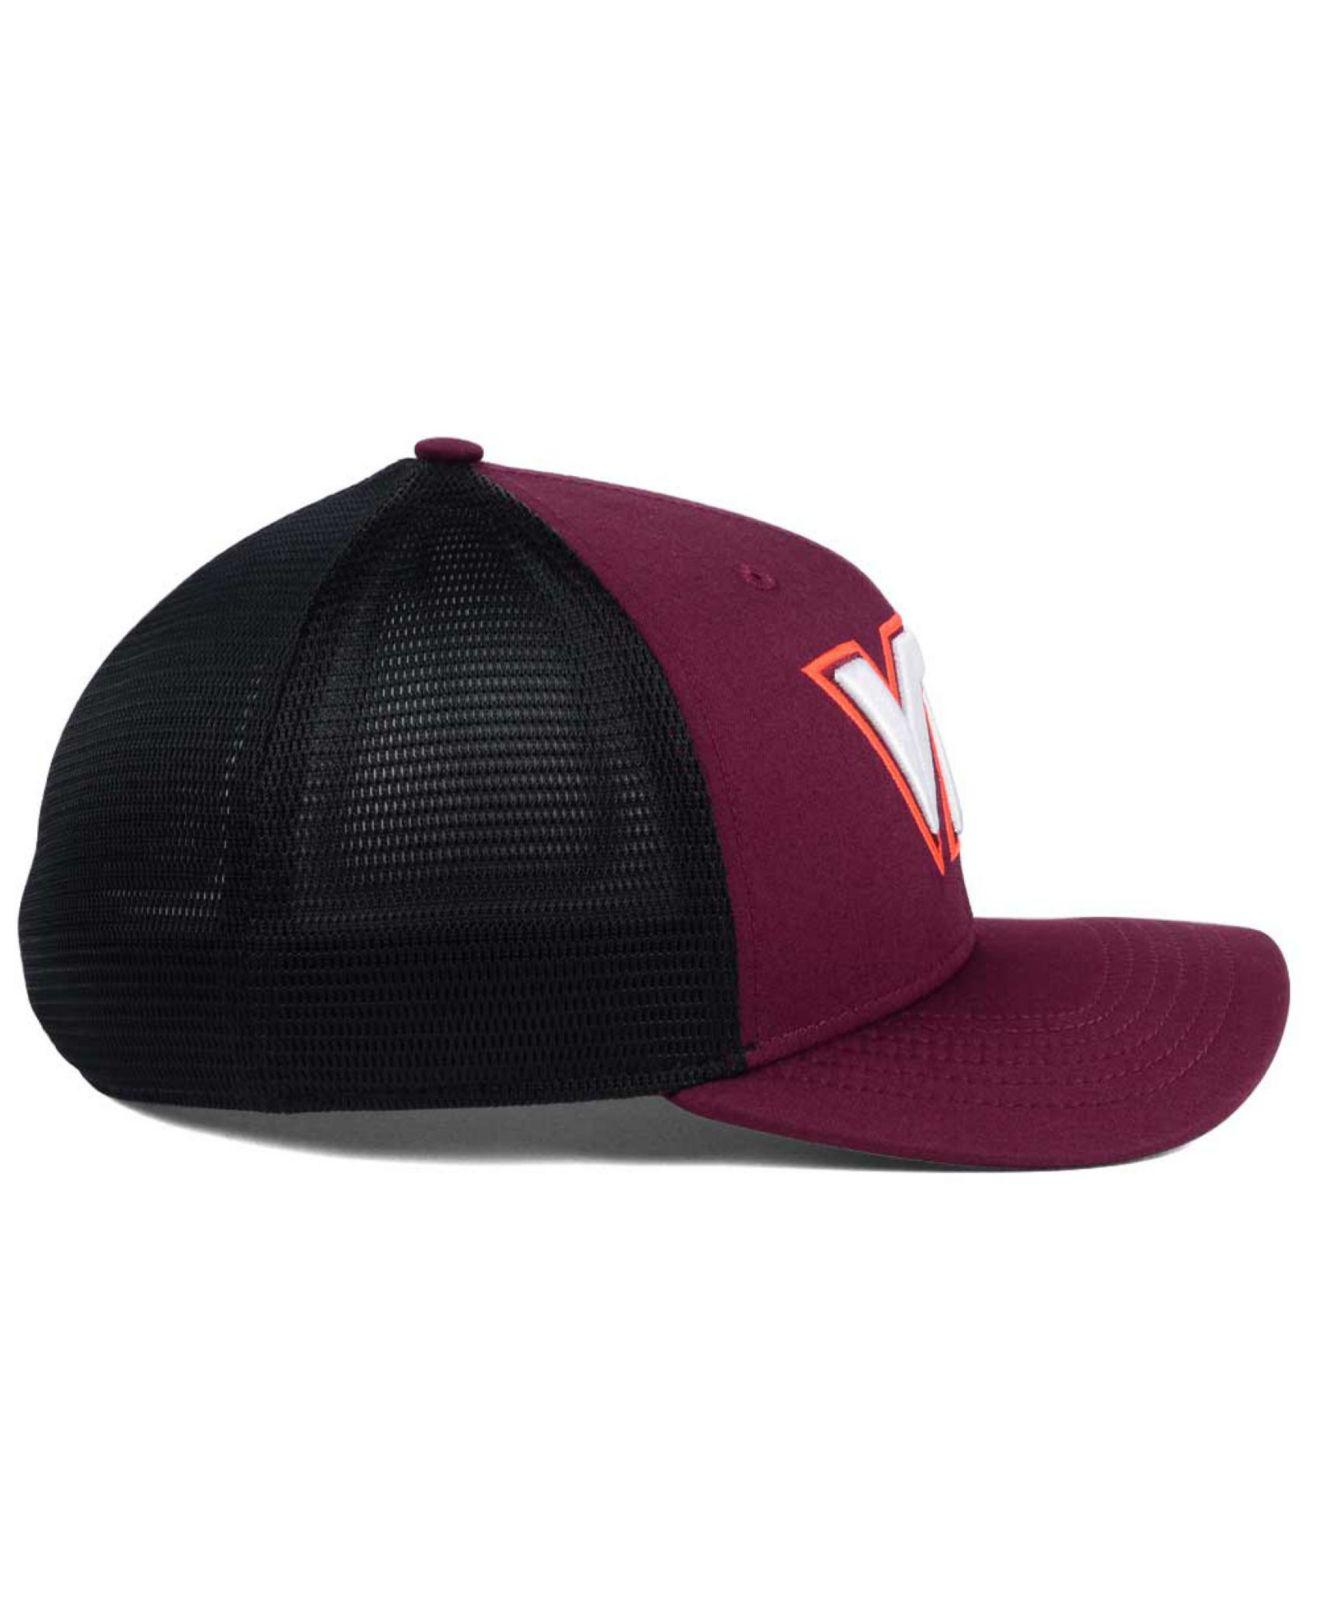 online store 8be02 f505a ... adjustable hat maroon 2bed0 d936e  get lyst nike virginia tech hokies  aero bill mesh swooshflex cap for men 37c4f eceb0